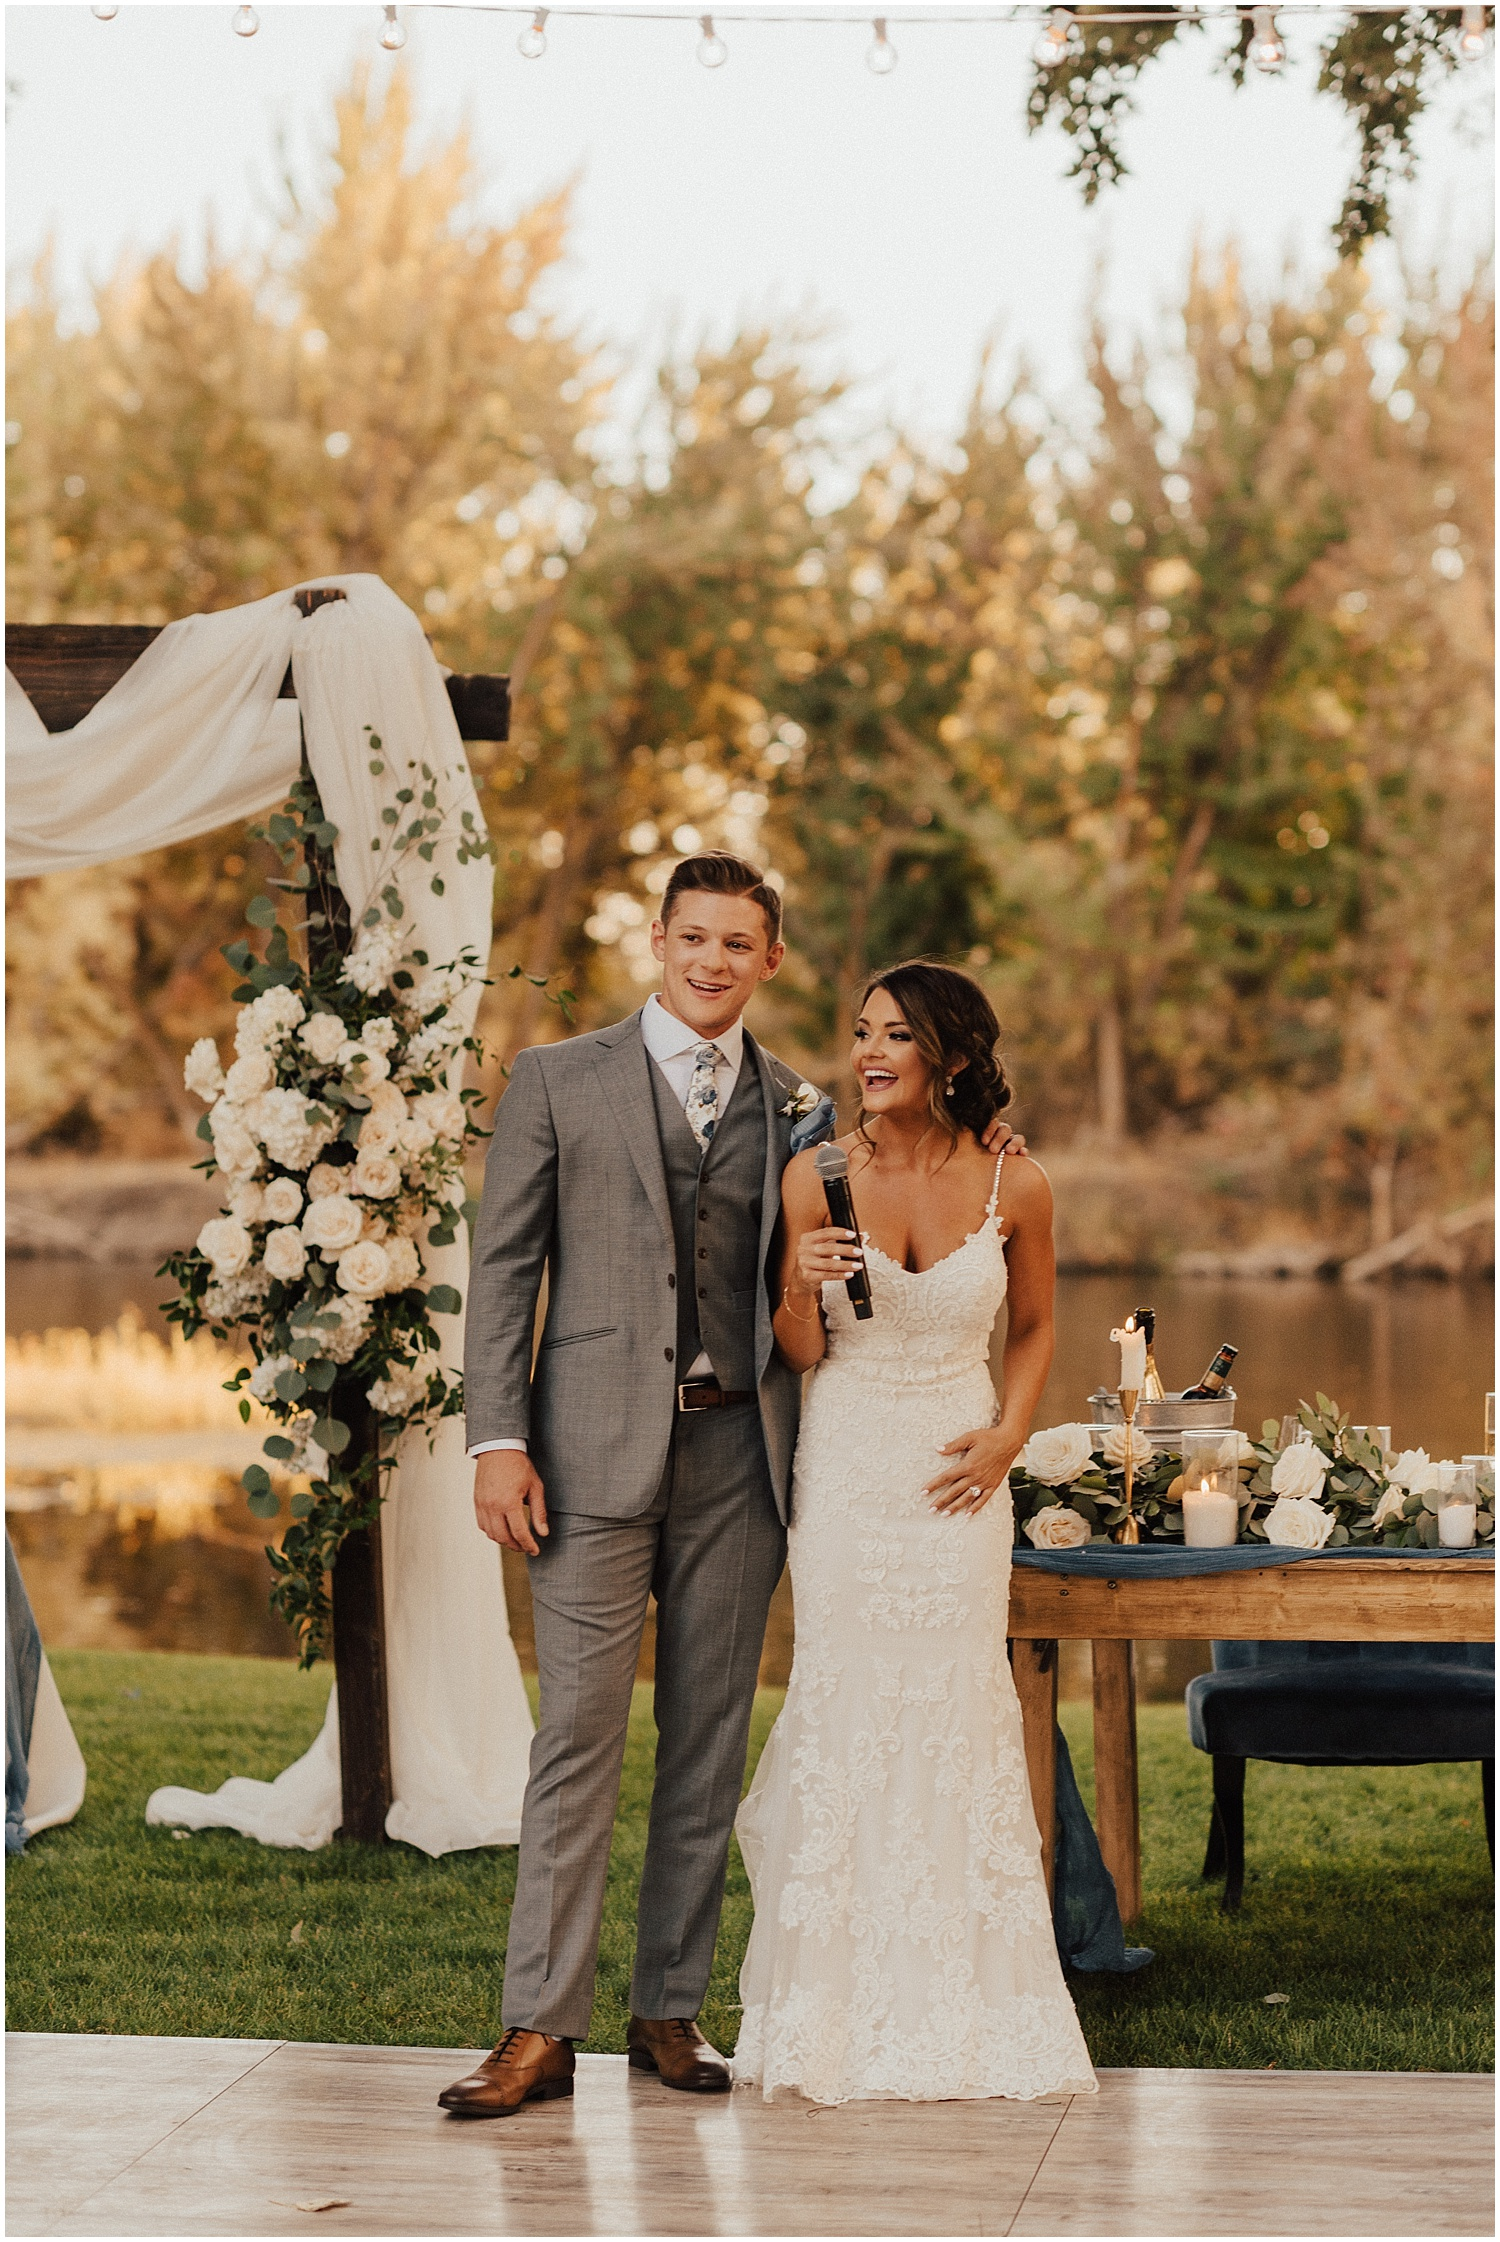 whimsical-summer-wedding-boise-idaho-las-vegas-bride195.jpg